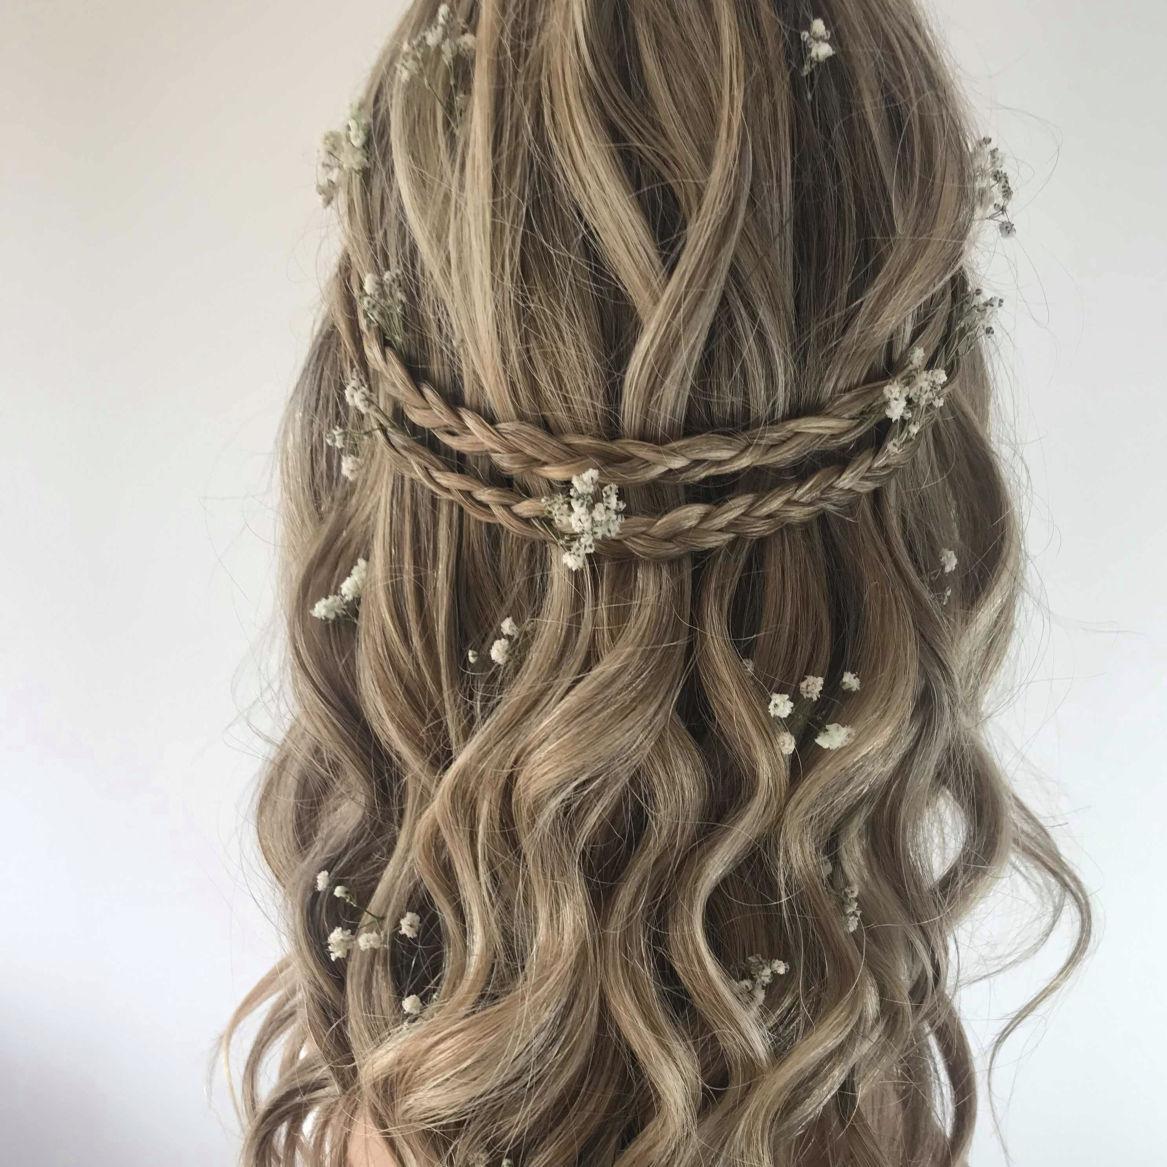 boho-bridal-hair-style-with-flowers-London